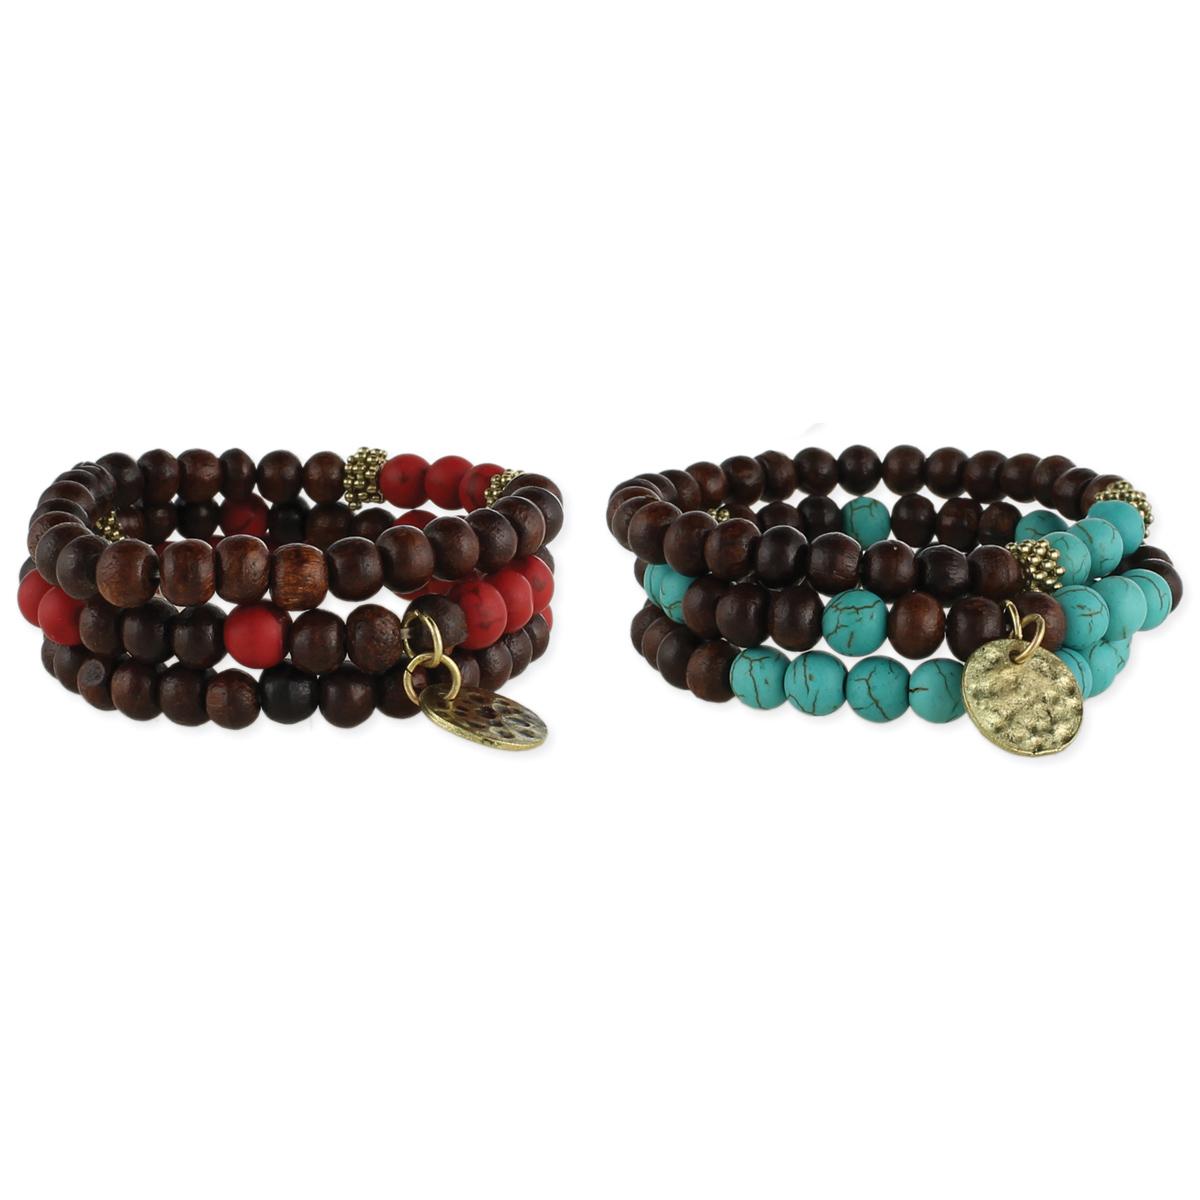 Dark Wood Bead Coil Bracelet